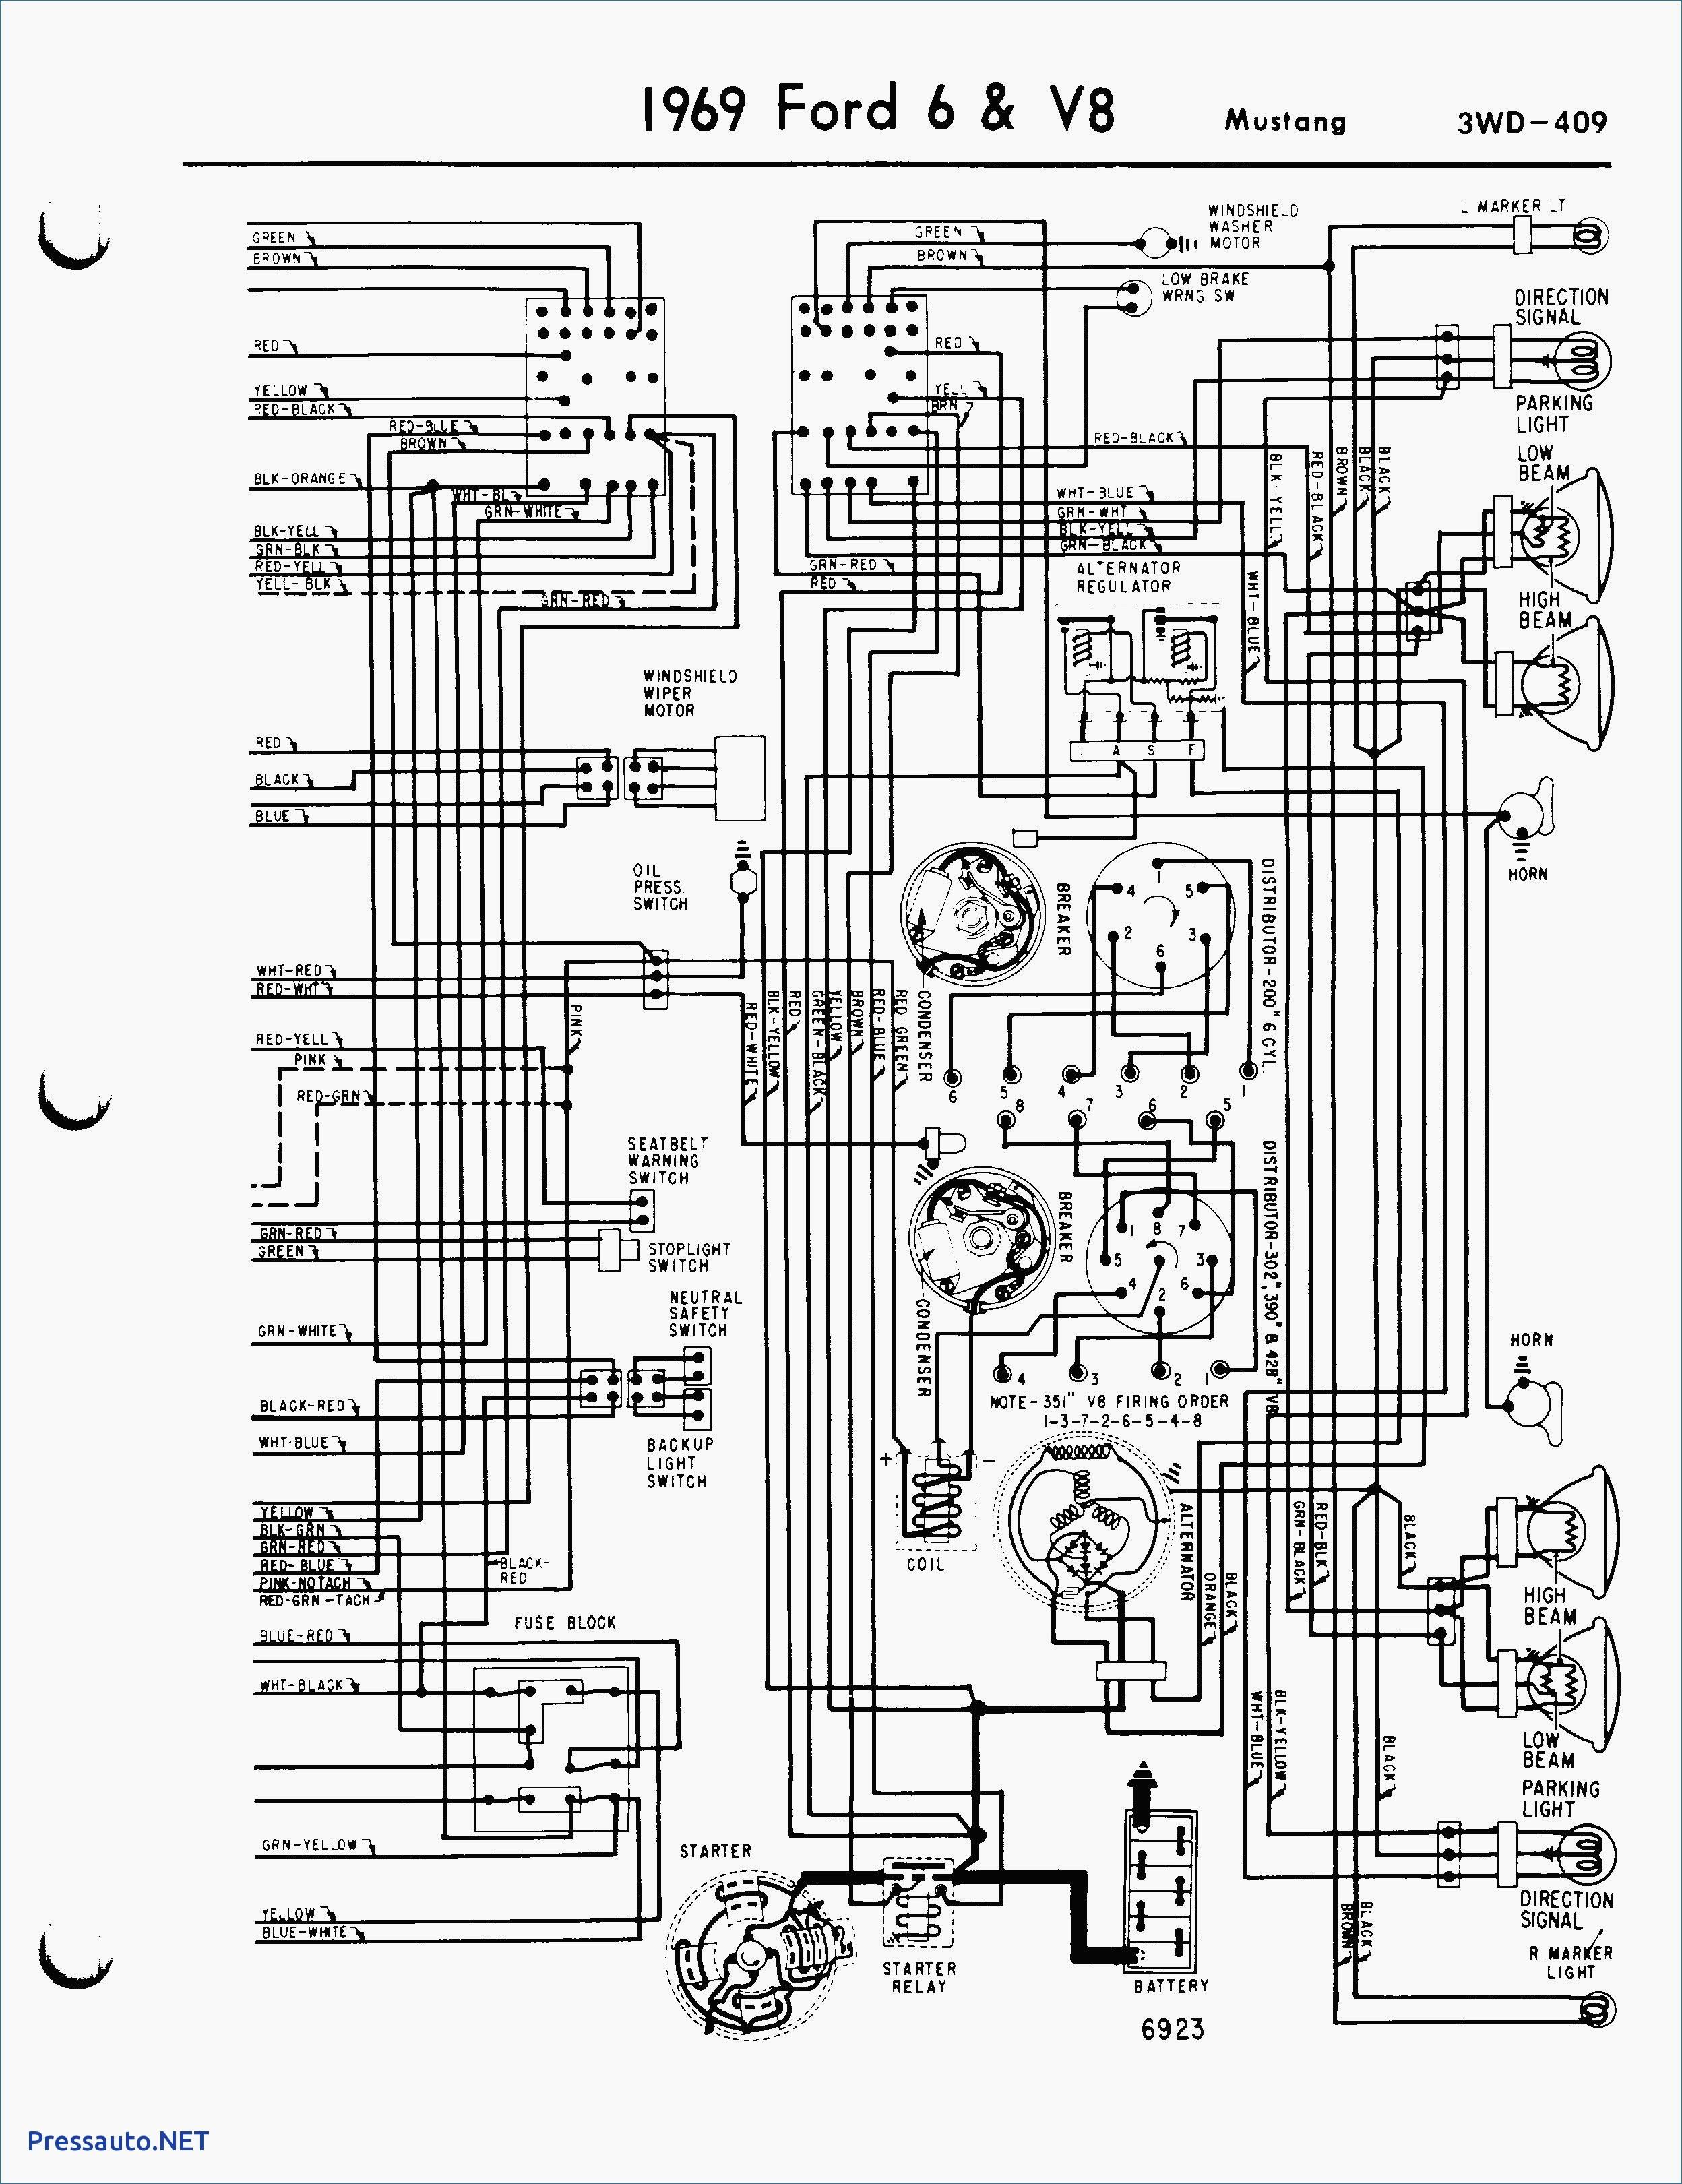 External Regulator Alternator Wiring Diagram Image Pressauto NET